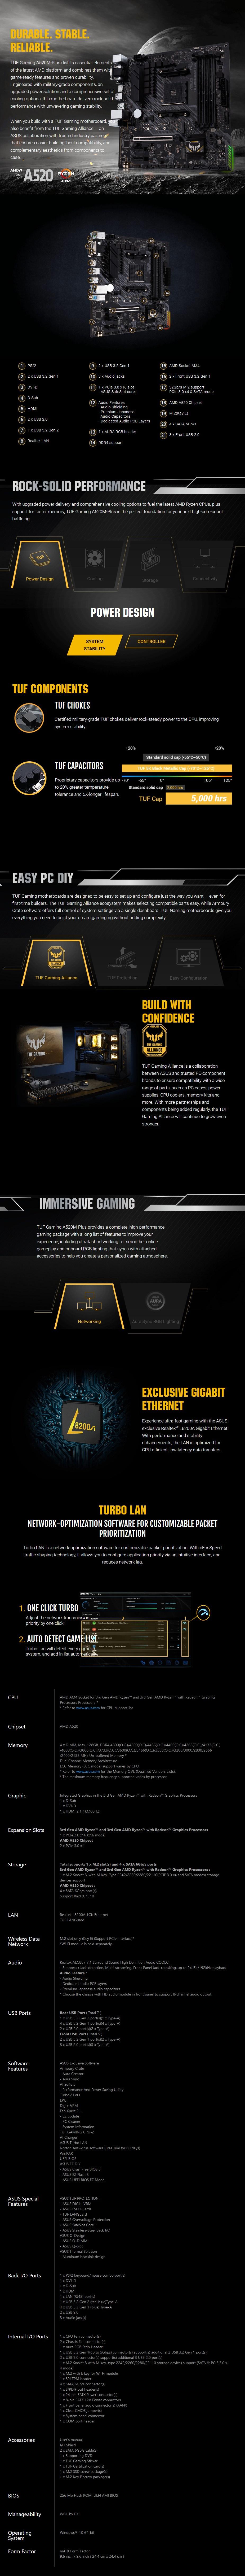 asus-tuf-gaming-a520mplus-am4-microatx-motherboard-ac37332-9.jpg